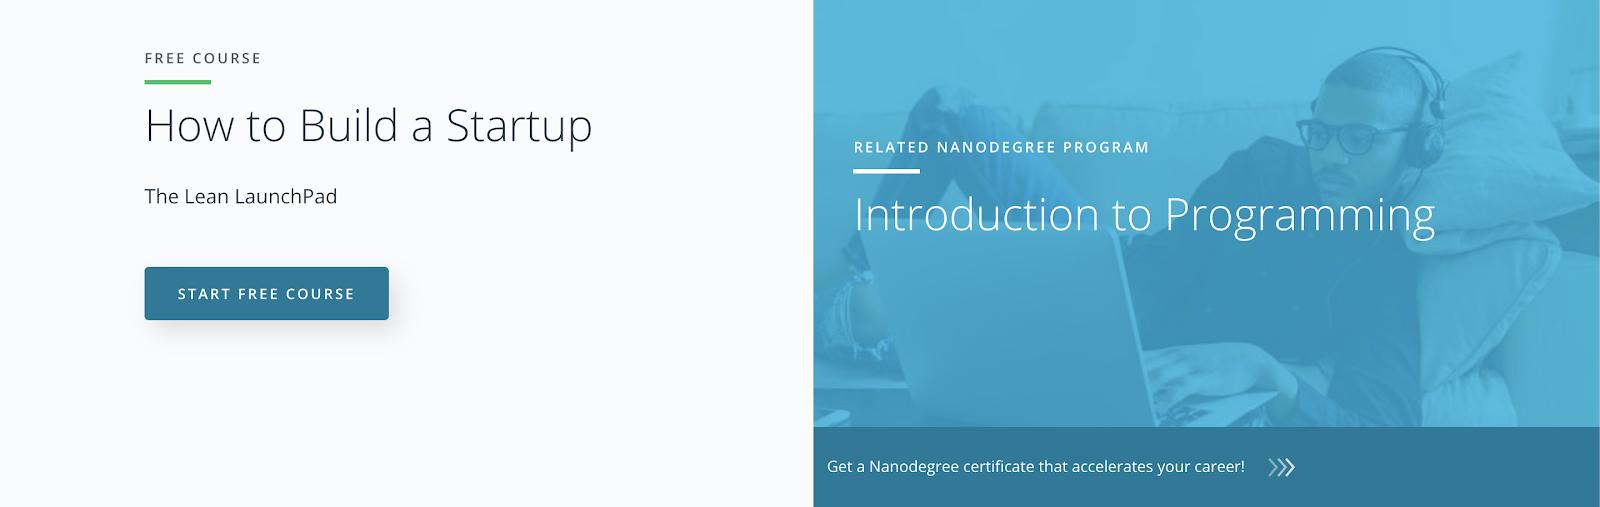 Entrepreneur online courses #18: How to Build A Startup